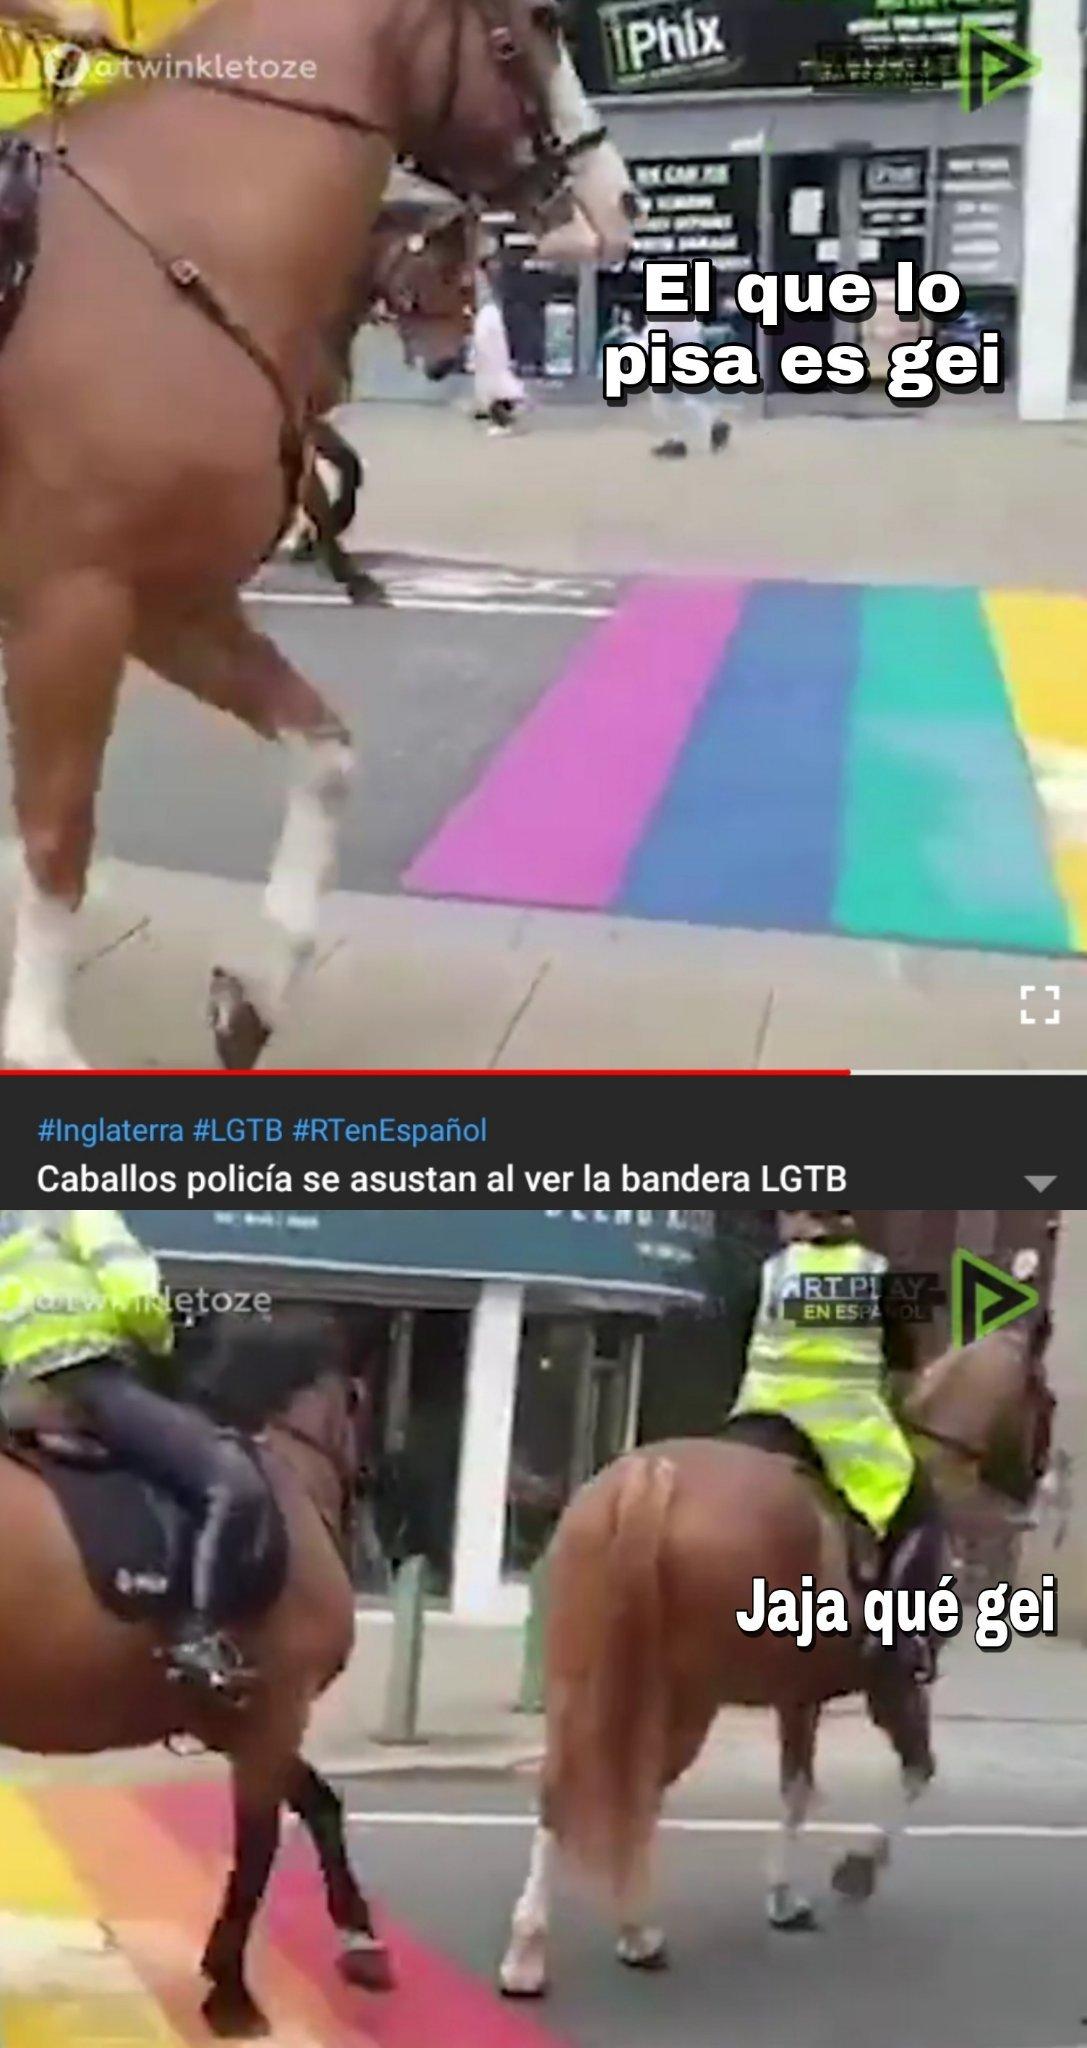 De chad jors vs de gei viryin jors - meme